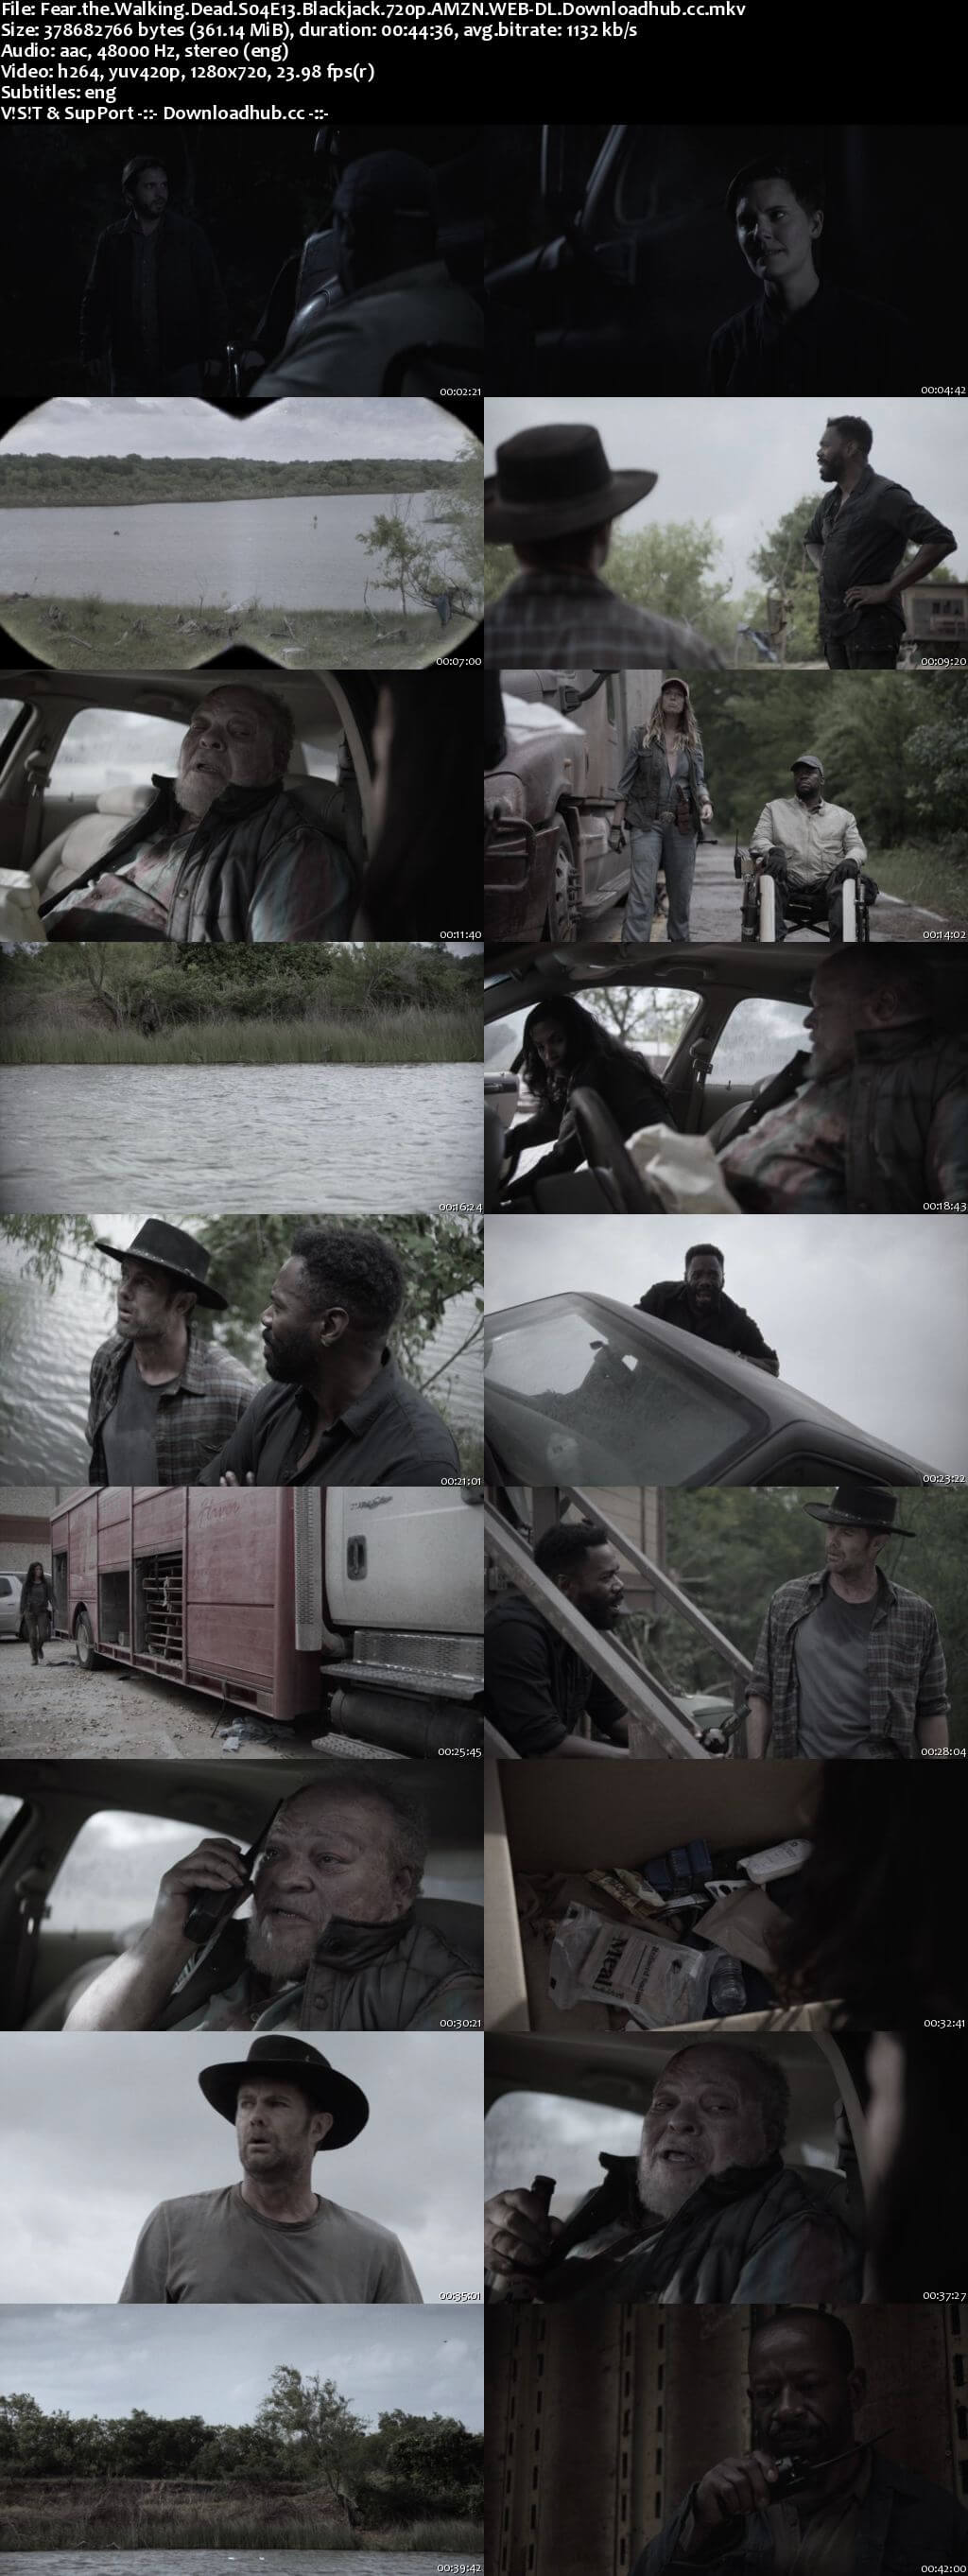 Fear the Walking Dead S04E13 350MB WEBRip 720p x264 ESubs